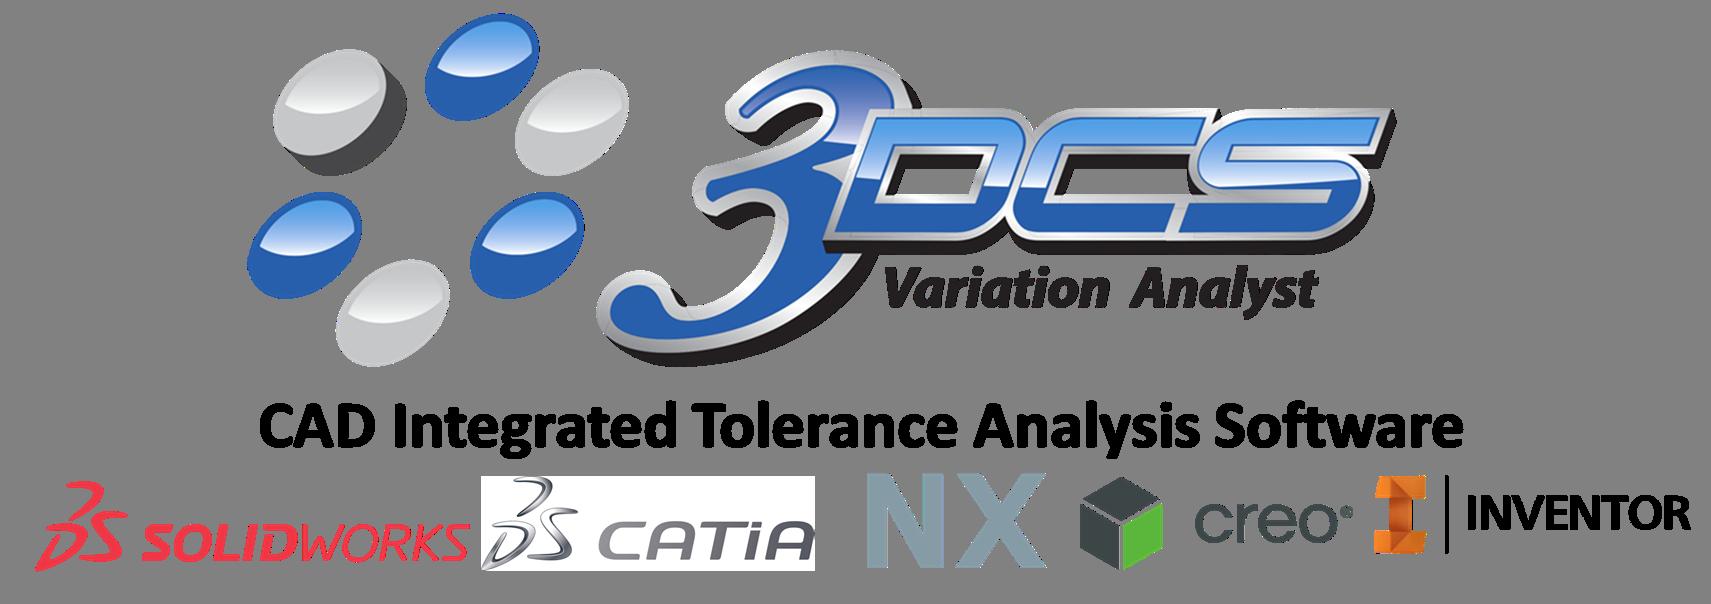 3dcs-tolerance-analysis-software-integrations